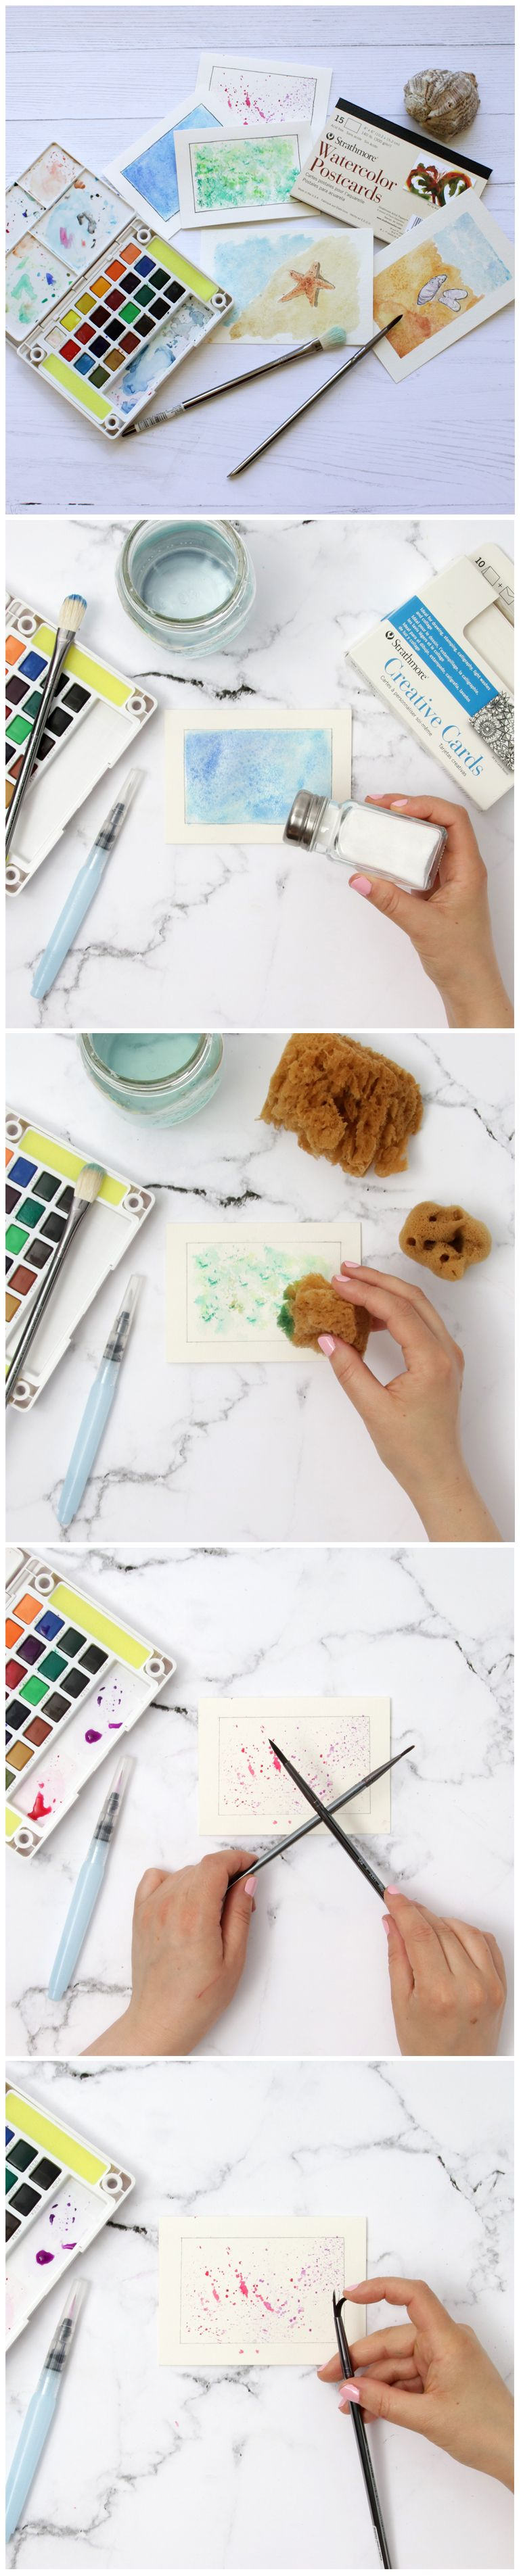 Technique Les Textures A L Aquarelle Creating Watercolour